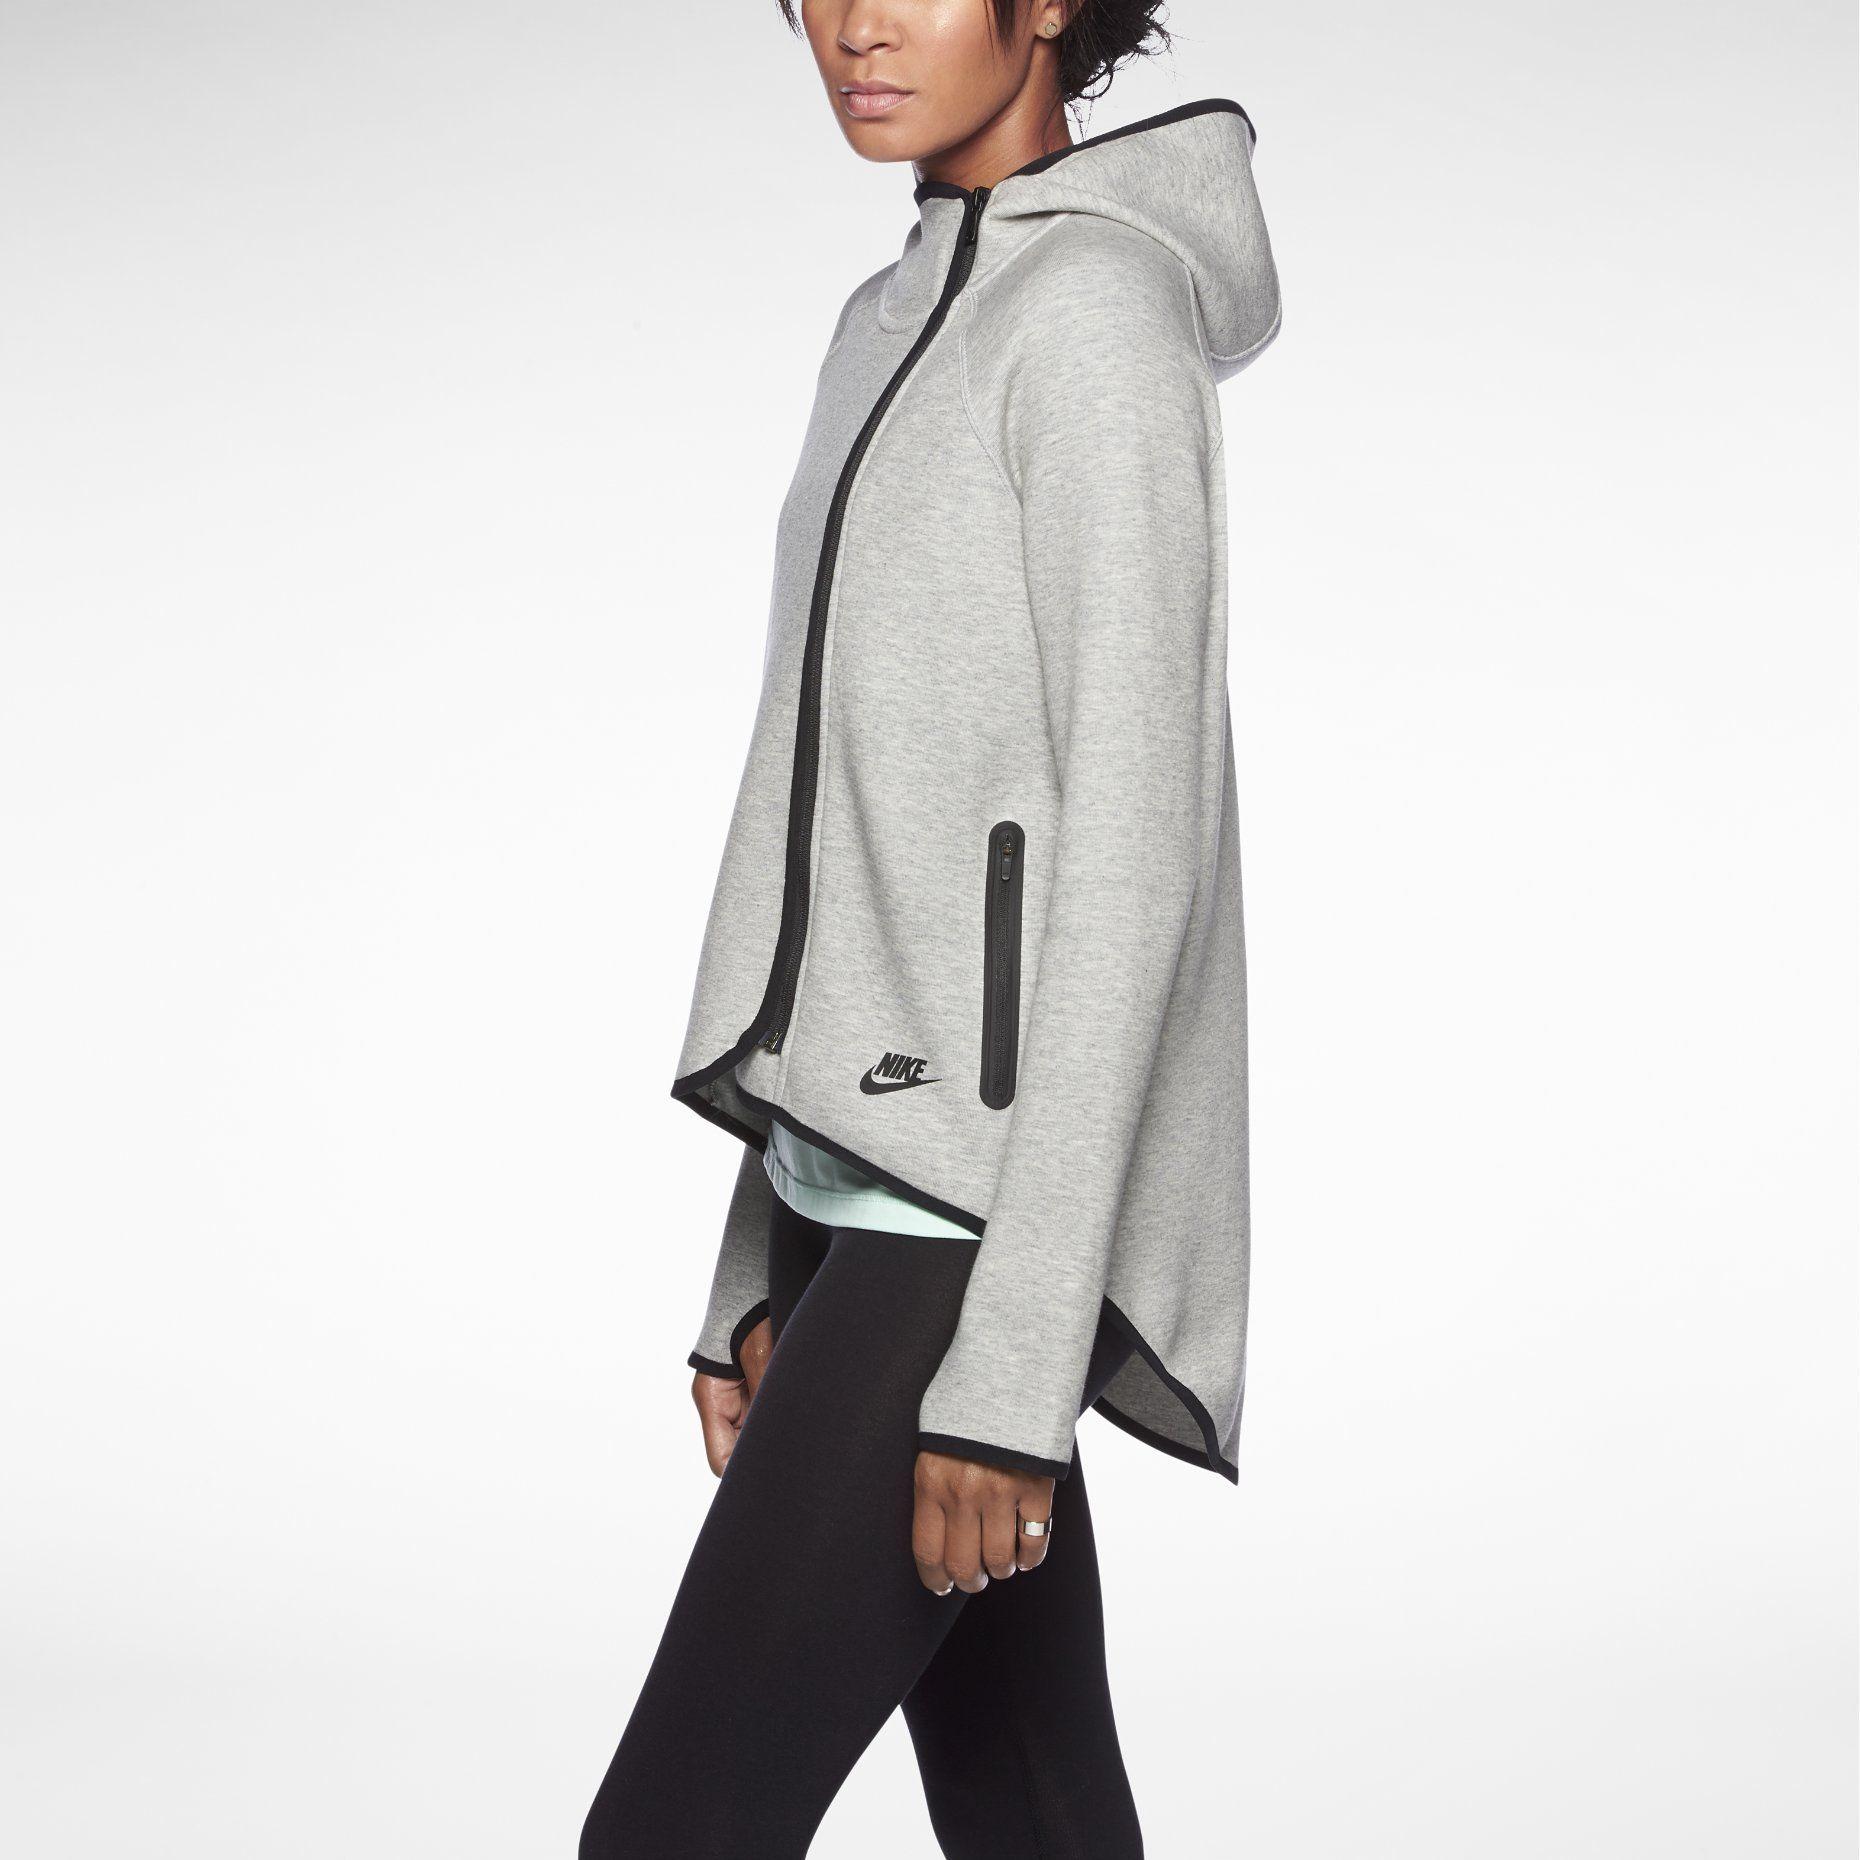 nike tech fleece cape women 39 s hoodie so yummy fun. Black Bedroom Furniture Sets. Home Design Ideas